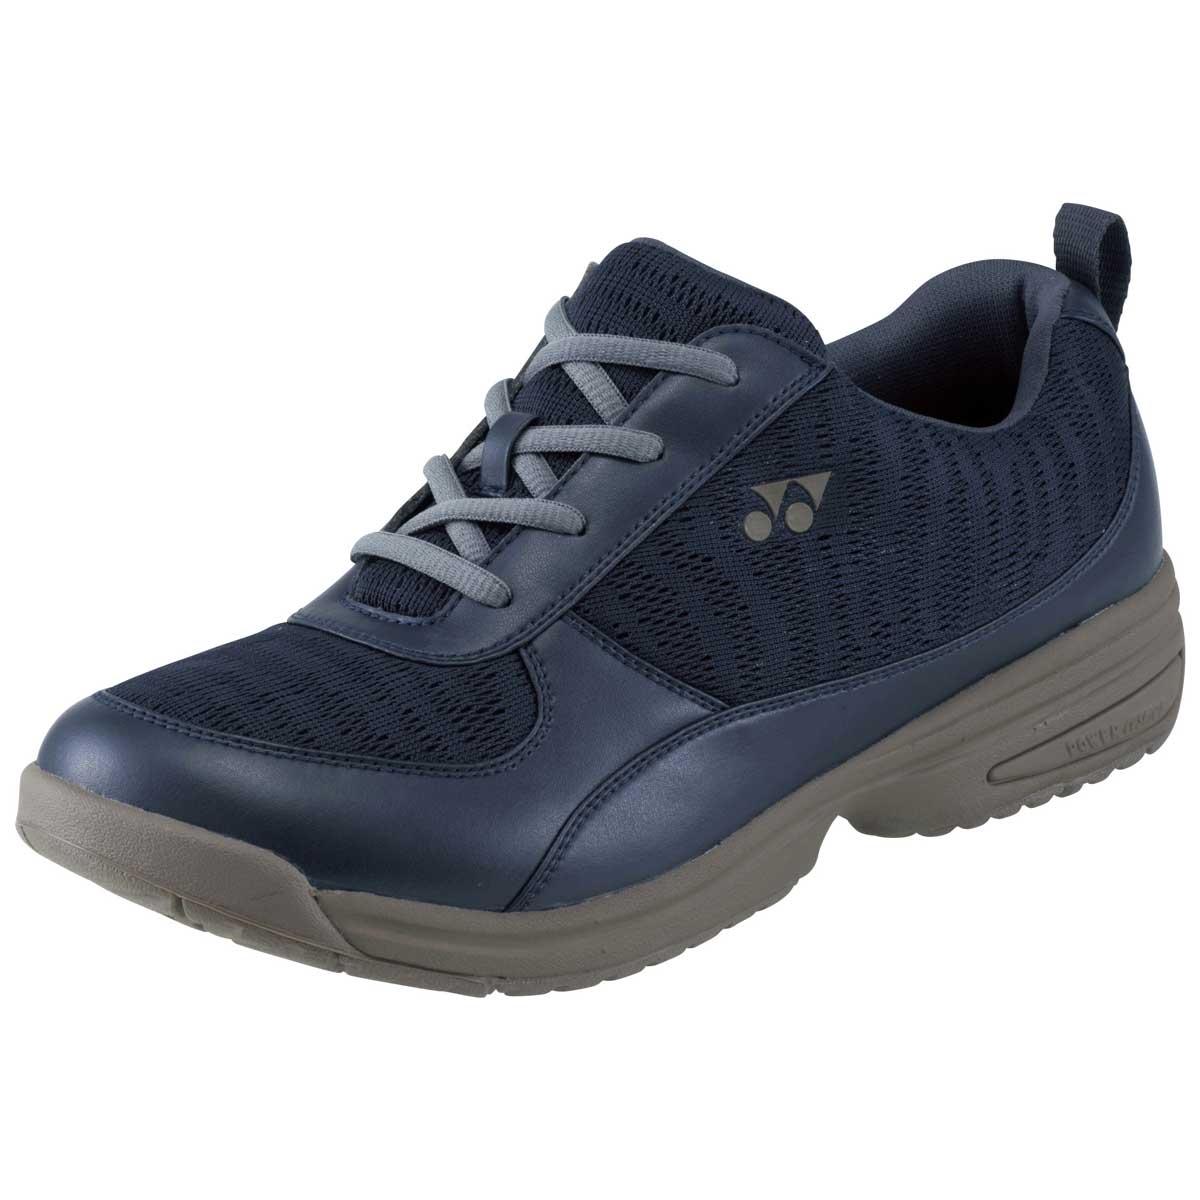 YONEX ヨネックス MC89 ネイビー (メンズ)軽い疲れにくいウォーキングシューズ「靴」